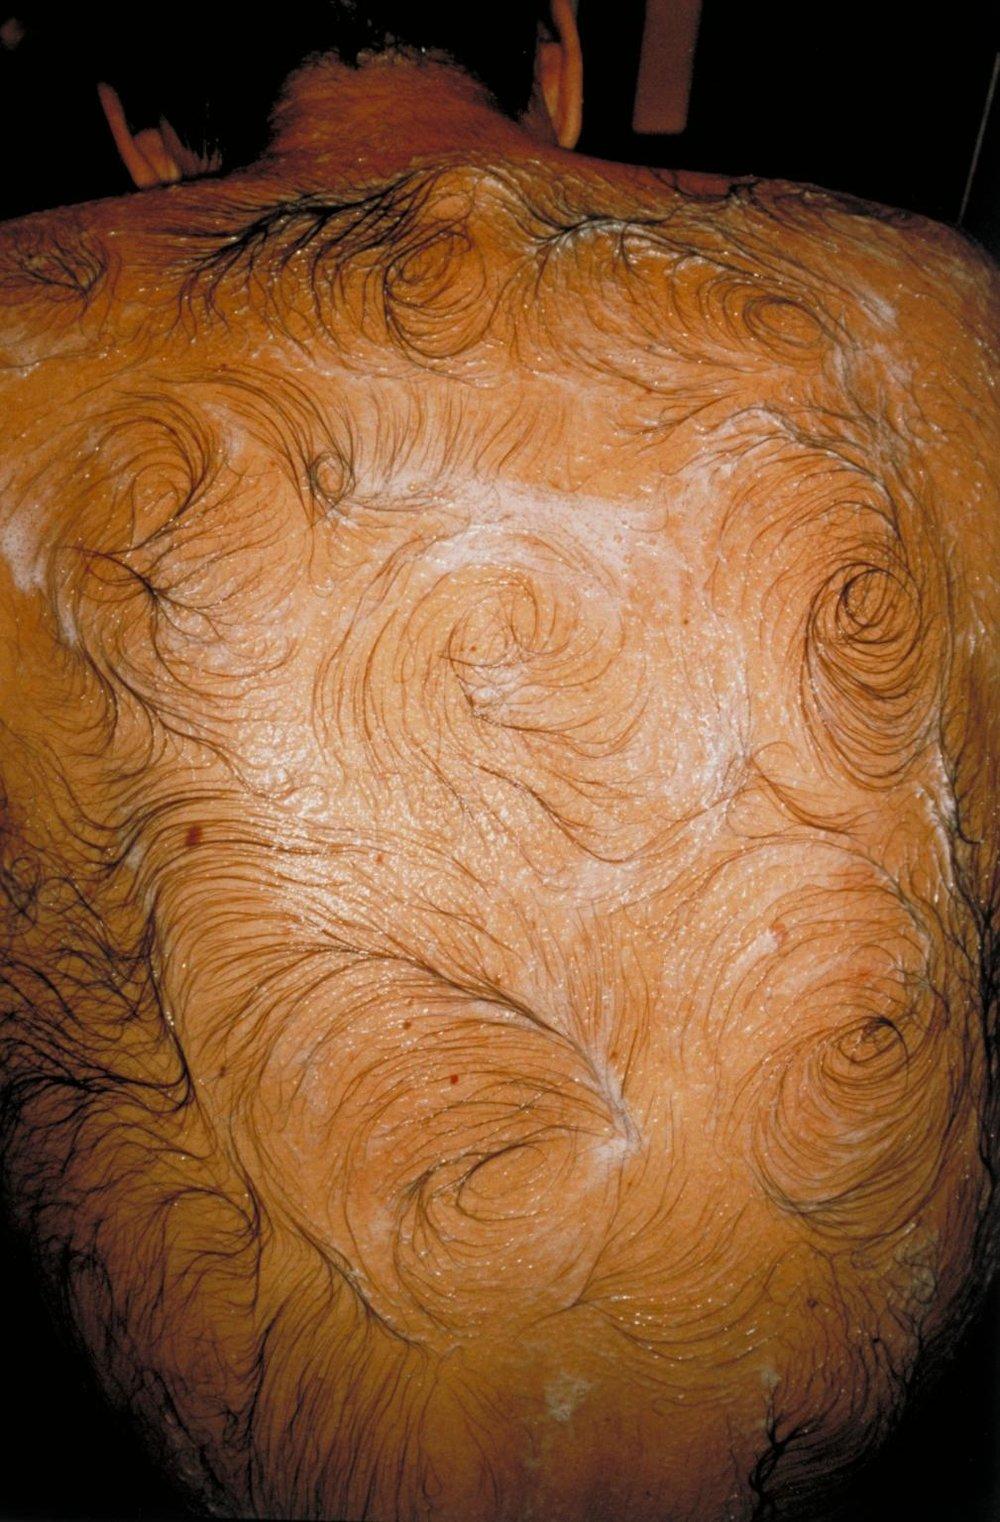 1995, Mona Hatoum, Van Gogh's Back.JPG